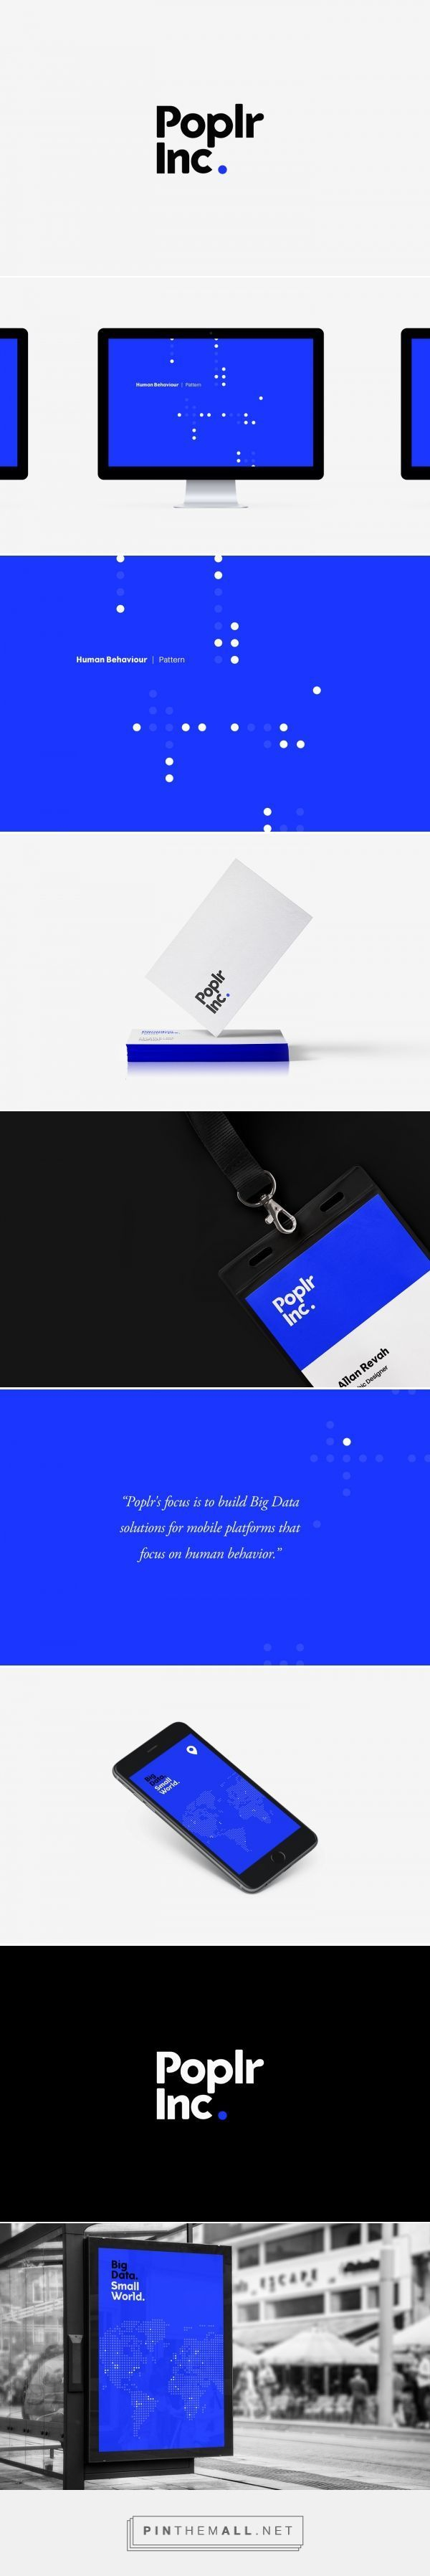 Poplr Inc. by Allan Revah | Fivestar Branding – Design and Branding Agency & Inspiration Gallery